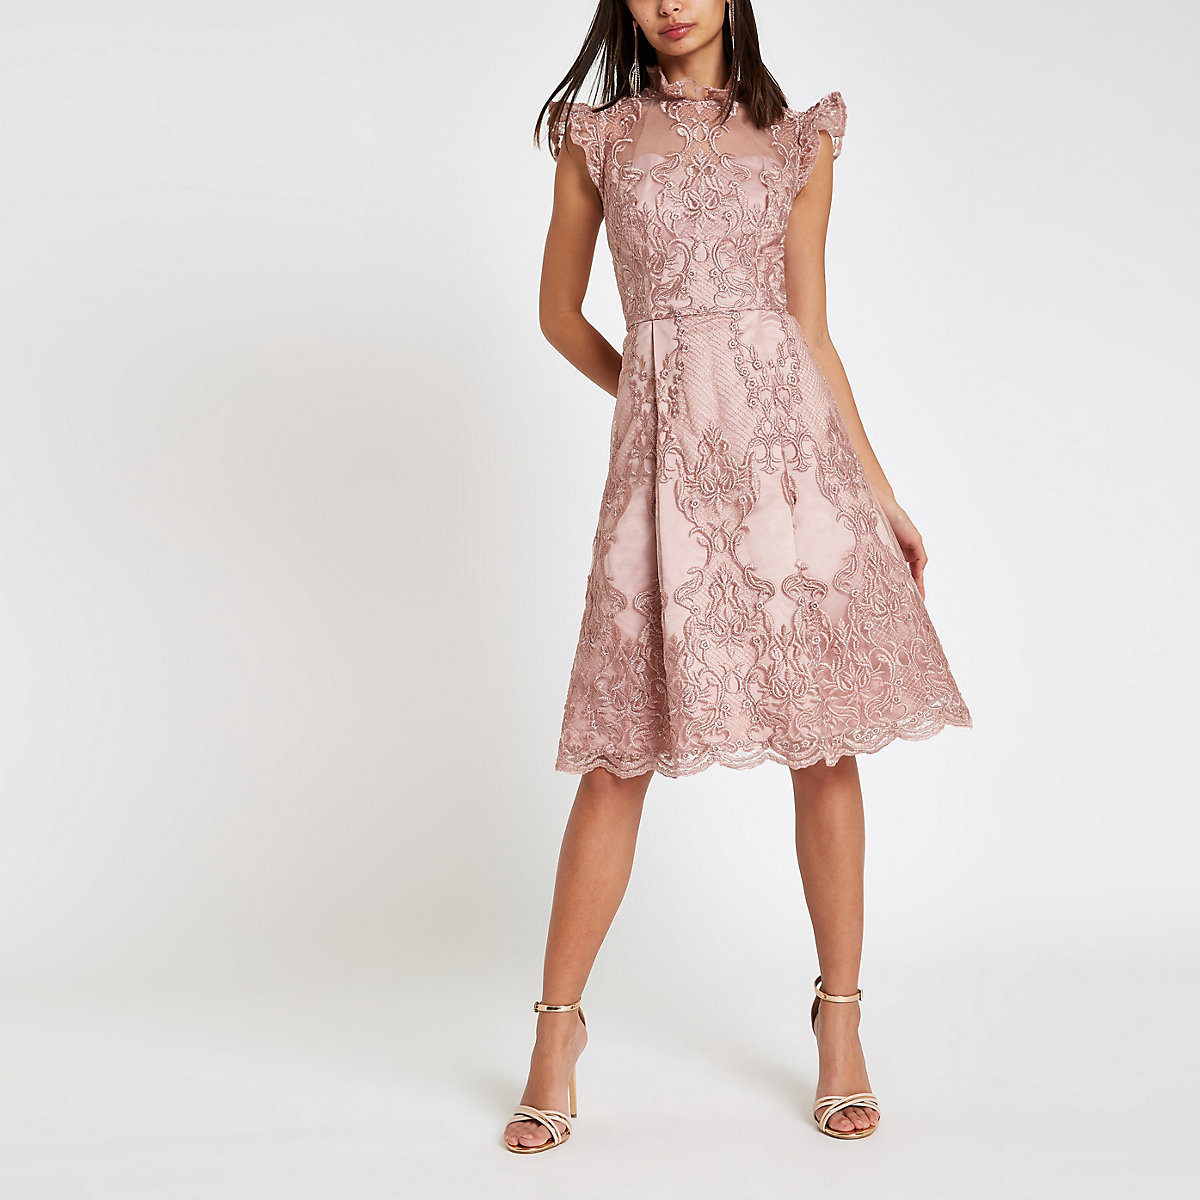 Chi Chi London pink lace flare dress